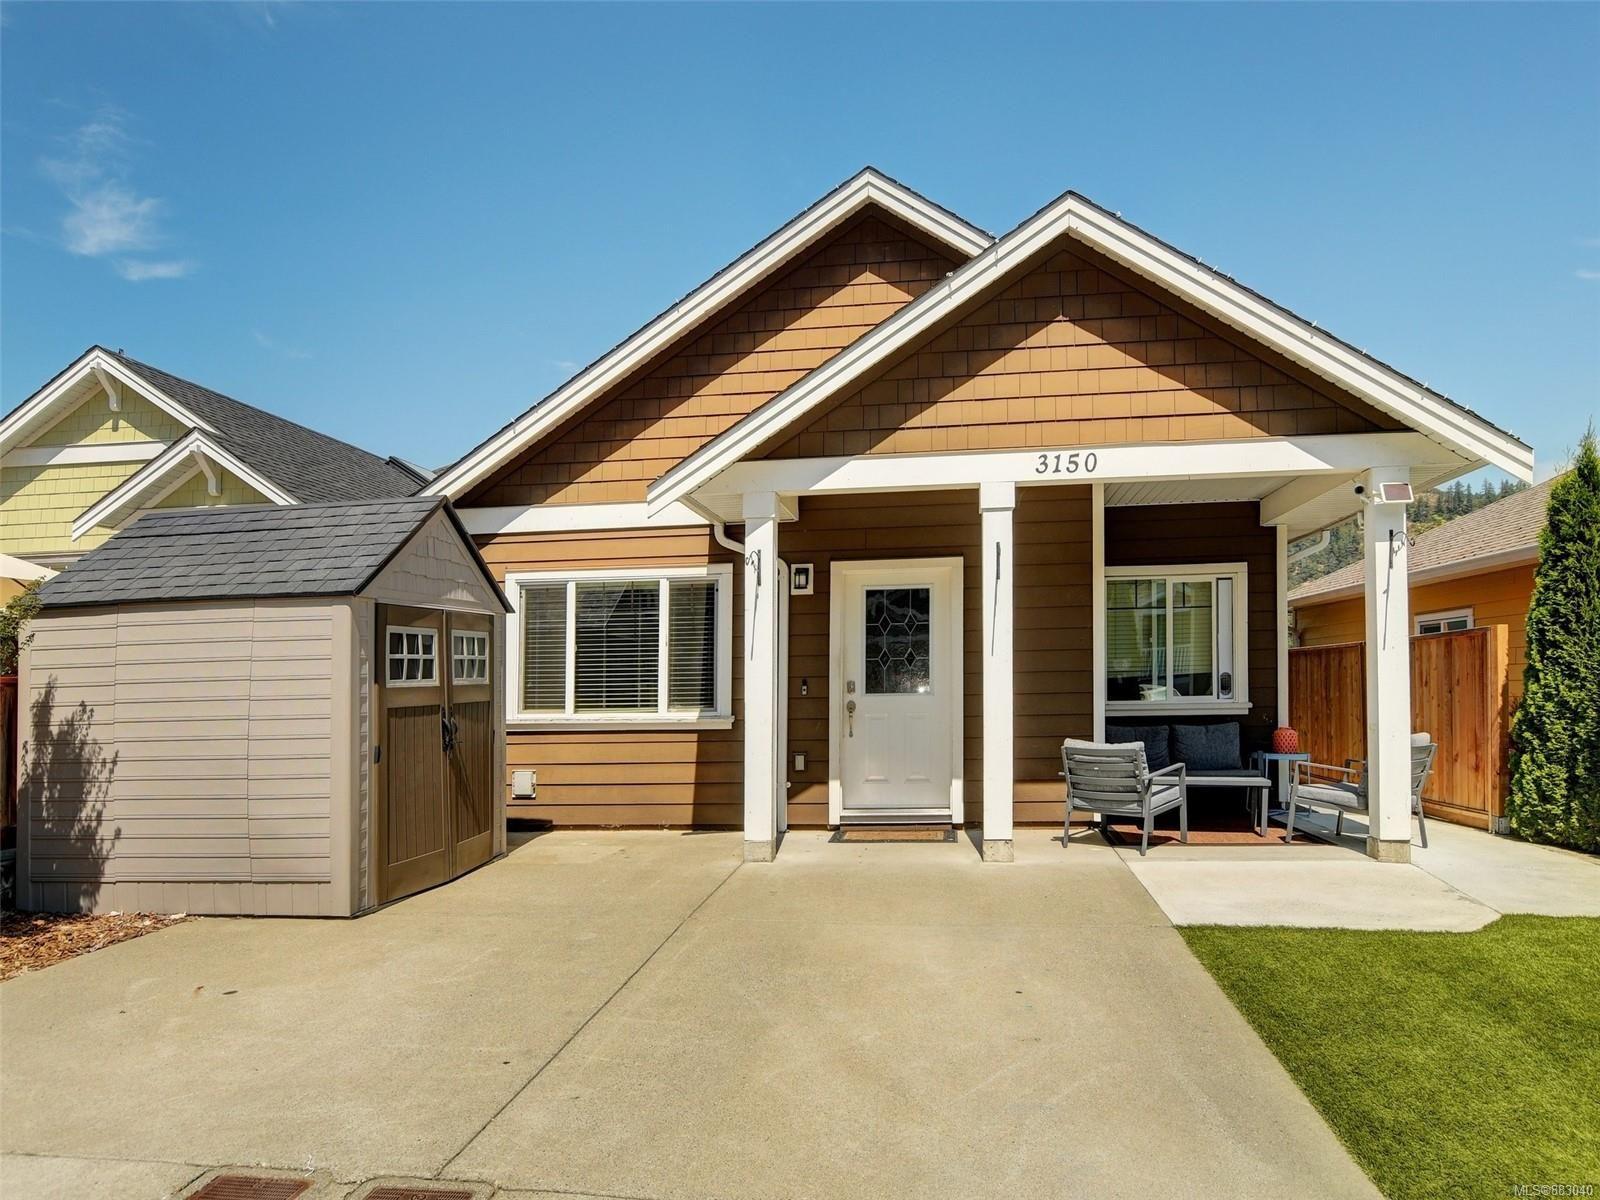 Main Photo: 3150 Kettle Creek Cres in : La Langford Lake House for sale (Langford)  : MLS®# 883040